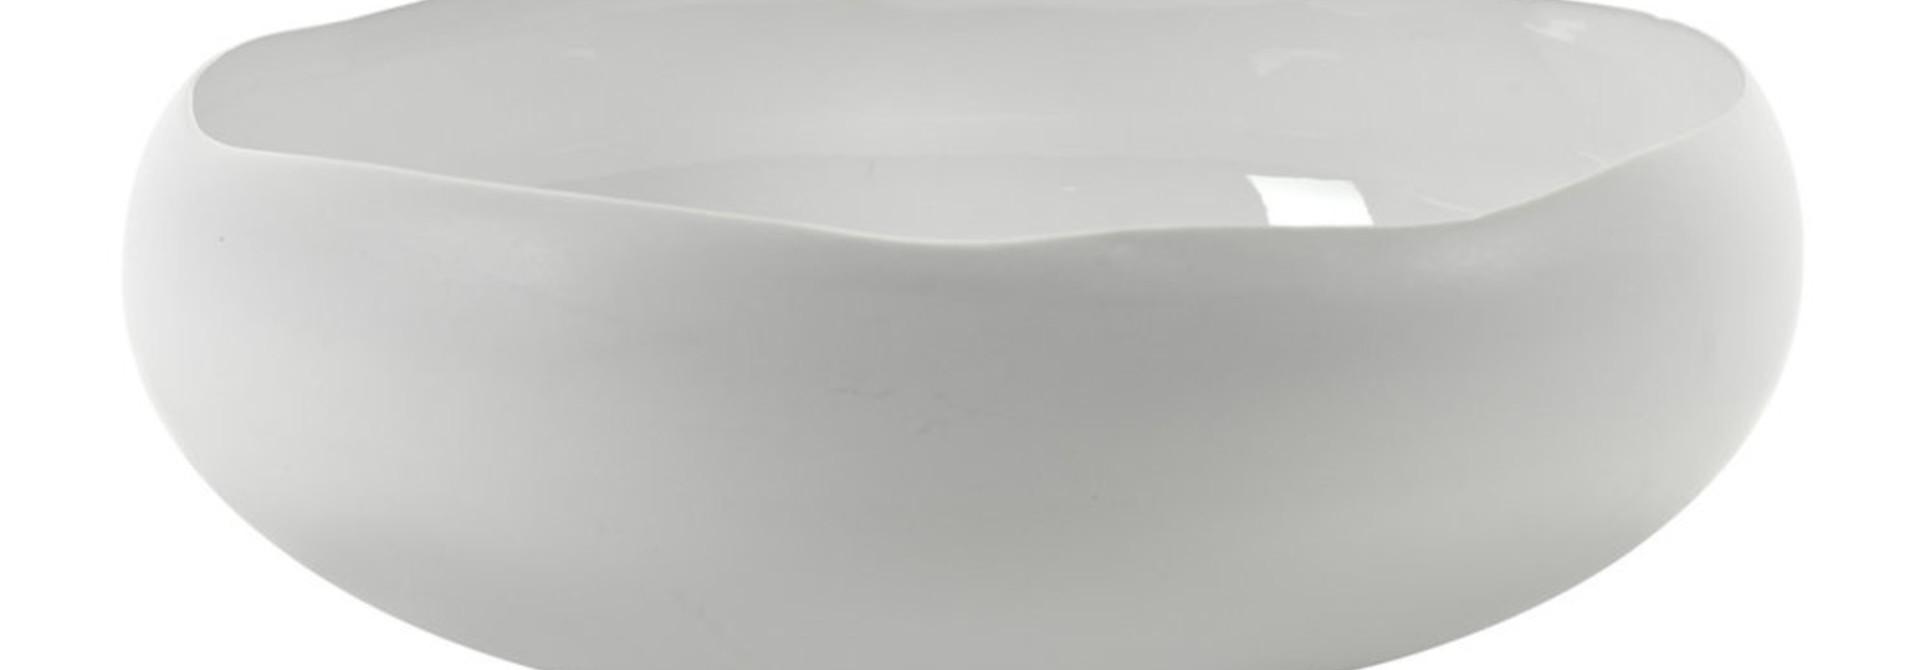 "13.5""  Bowl Irregular Shape - White"